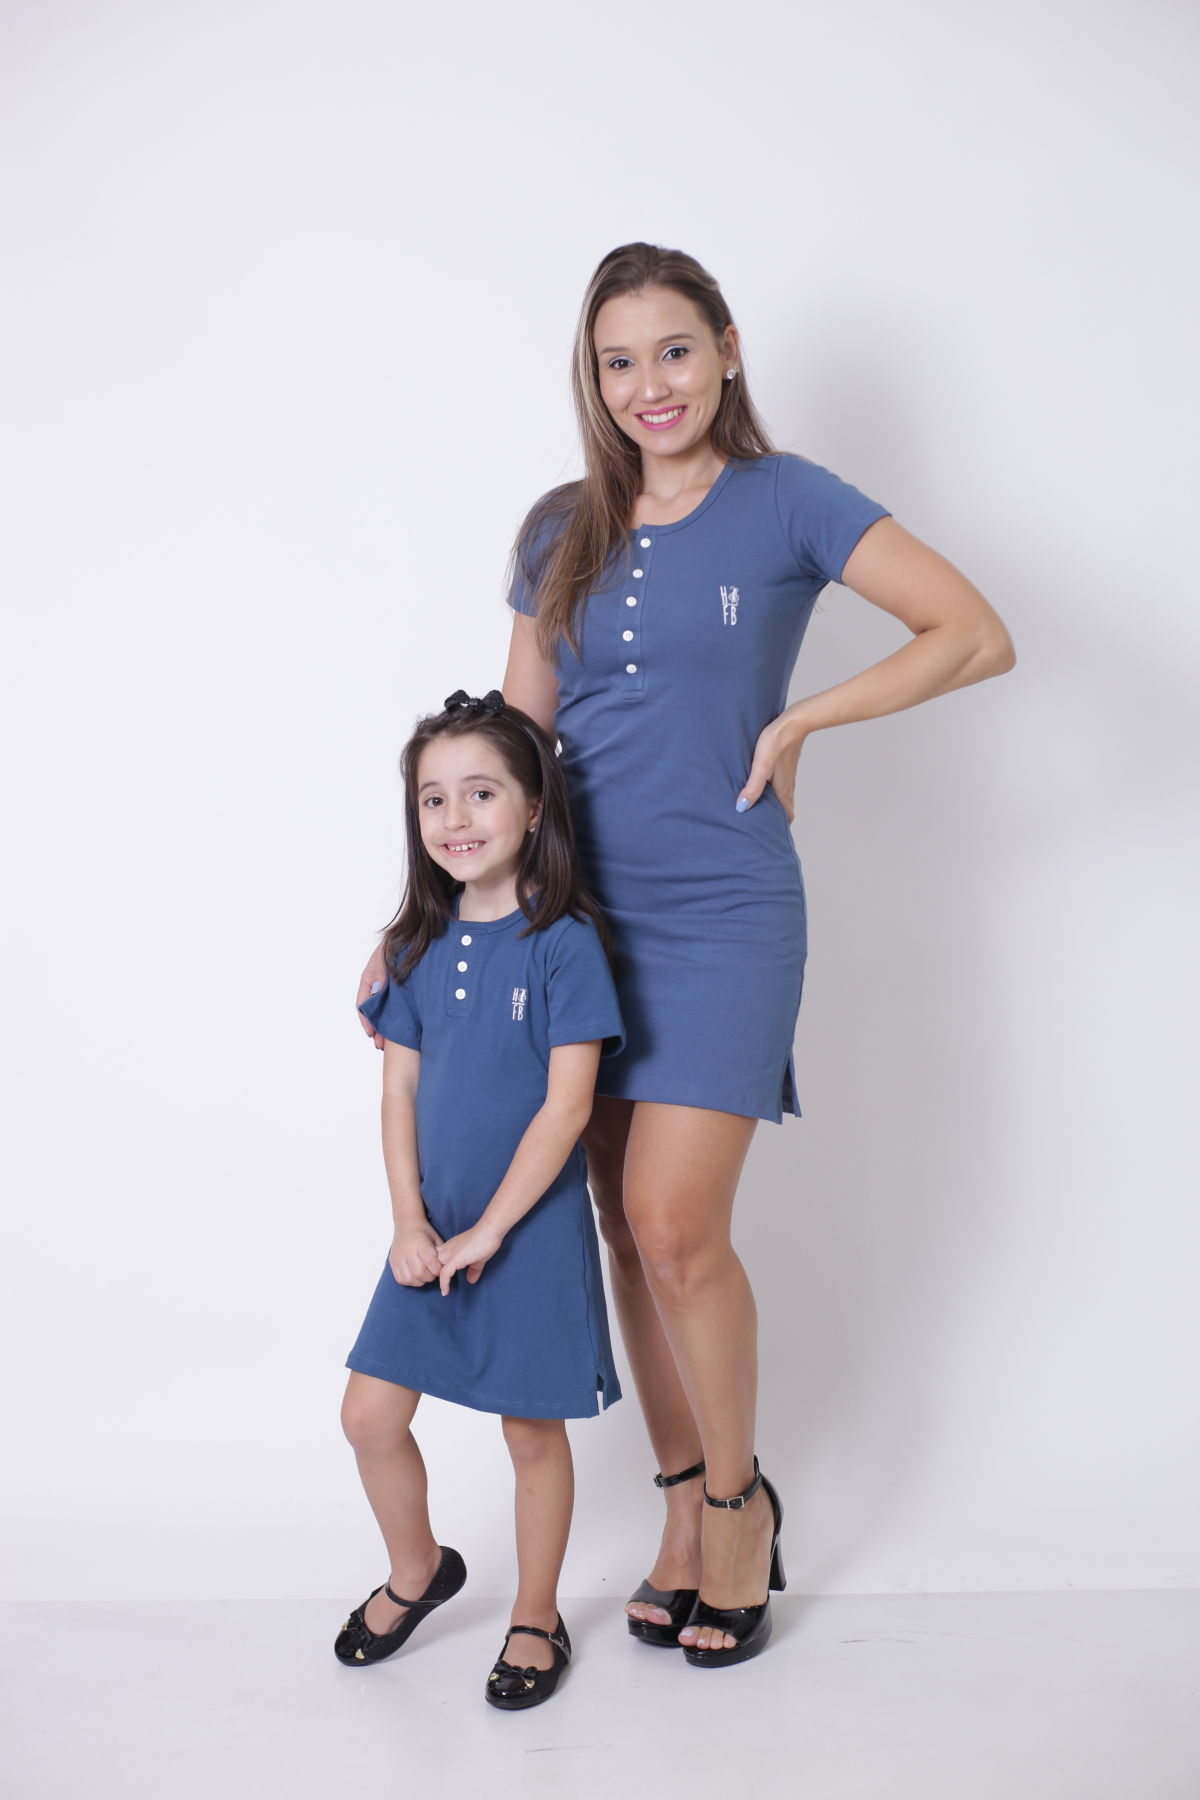 MÃE E FILHA > Kit Vestidos - Henley - Azul Petróleo [Coleção Tal Mãe Tal Filha]  - Heitor Fashion Brazil